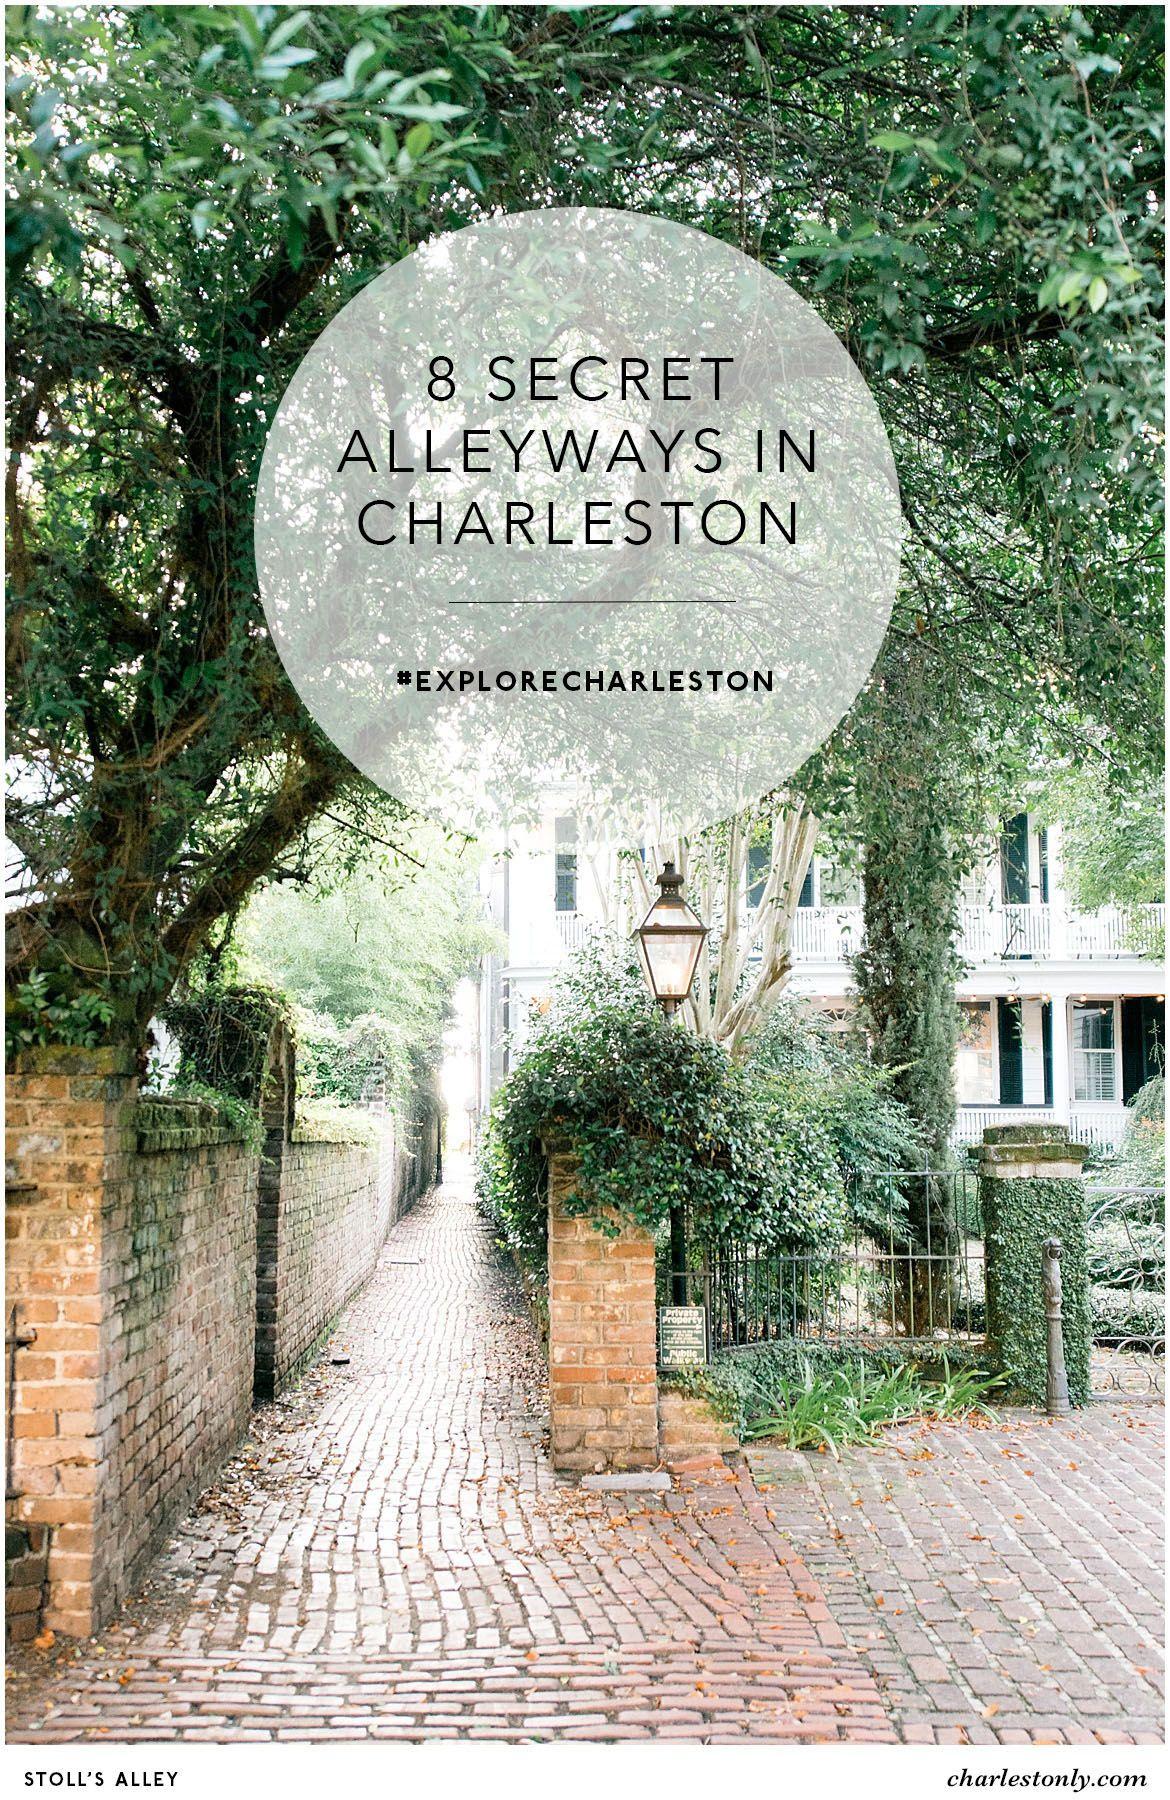 Ready to explore Charleston? Discover 8 secret alleyways in Charleston, South Carolina. | Charlestonly.com